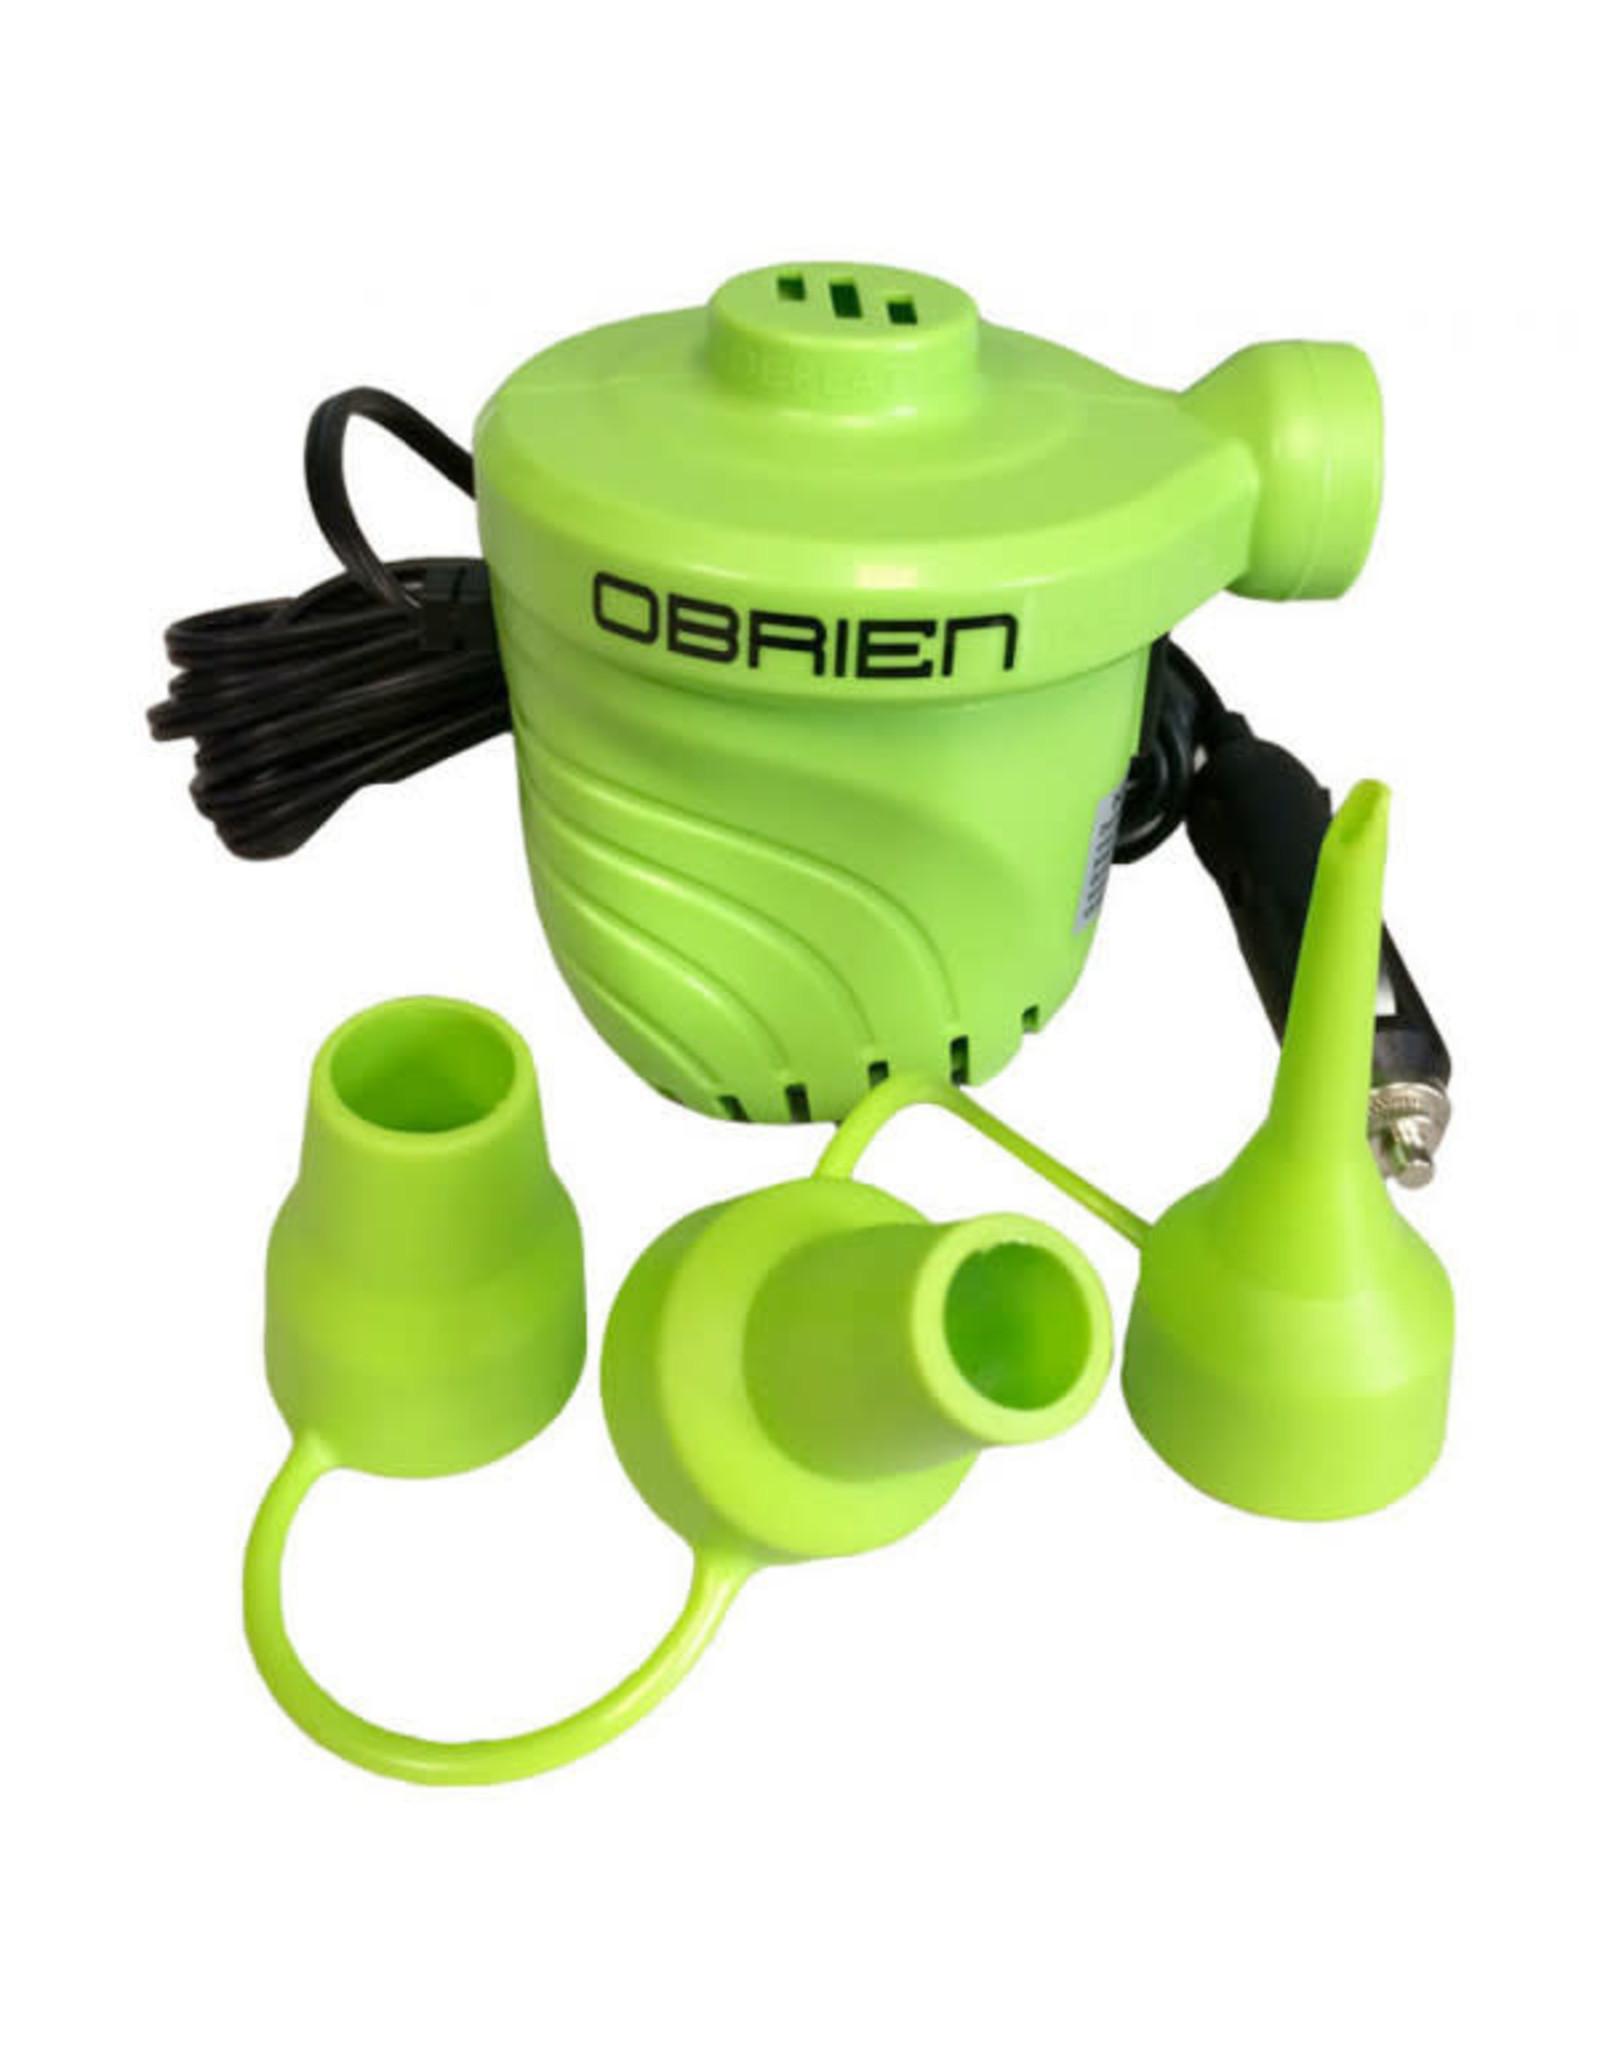 O'Brien 12V Inflator-PSI 1.2 Green